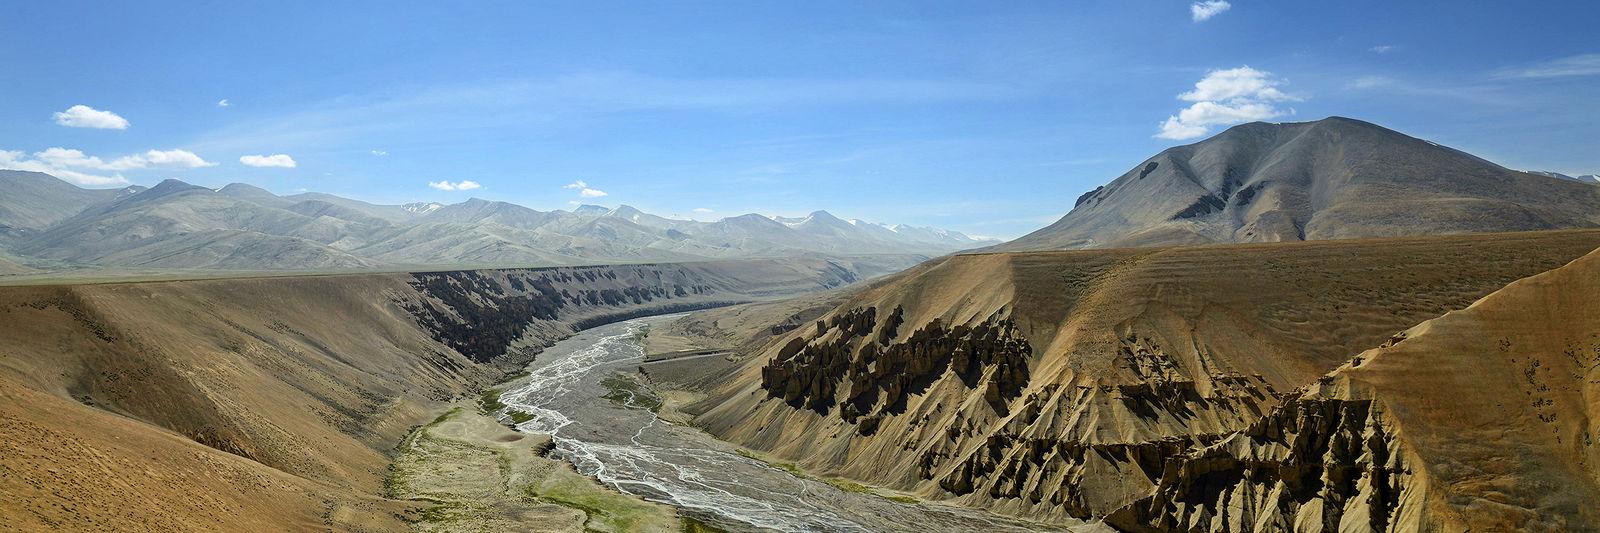 Ivan Aleshin. NH21 and other Himalayan Roads. 0007